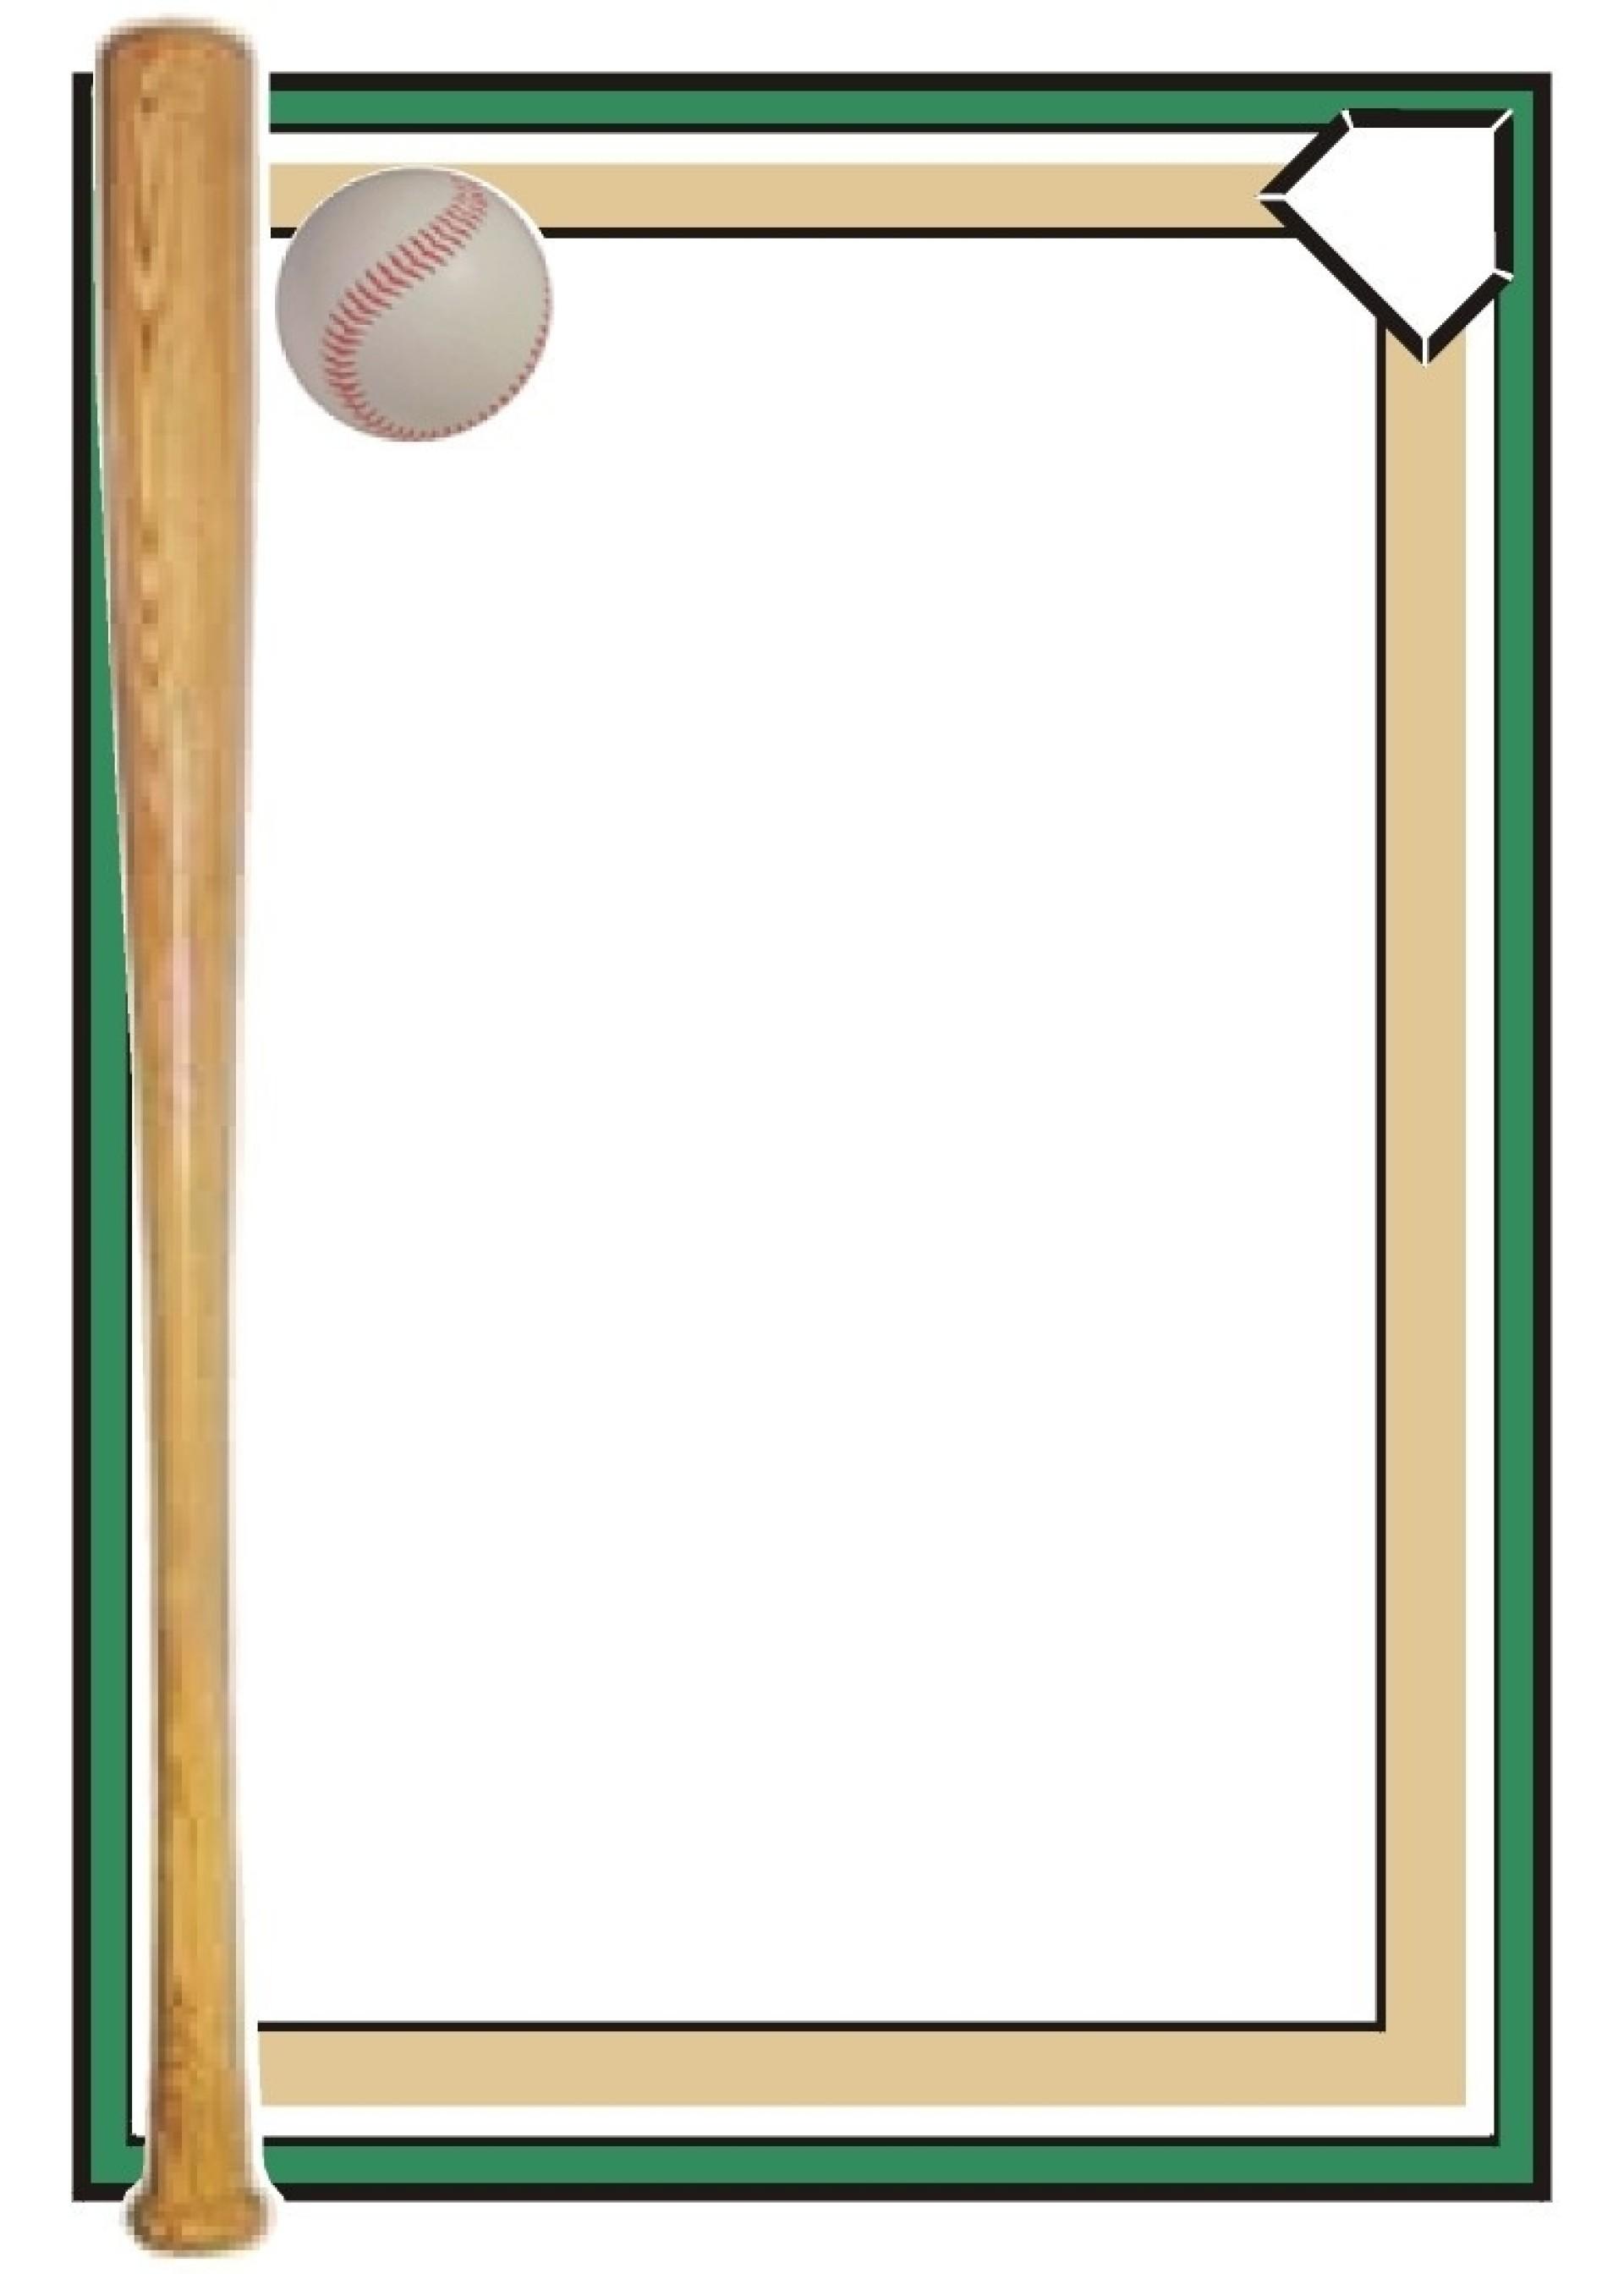 012 Template Ideas Baseball Card Free Borders Clipart Best Word.